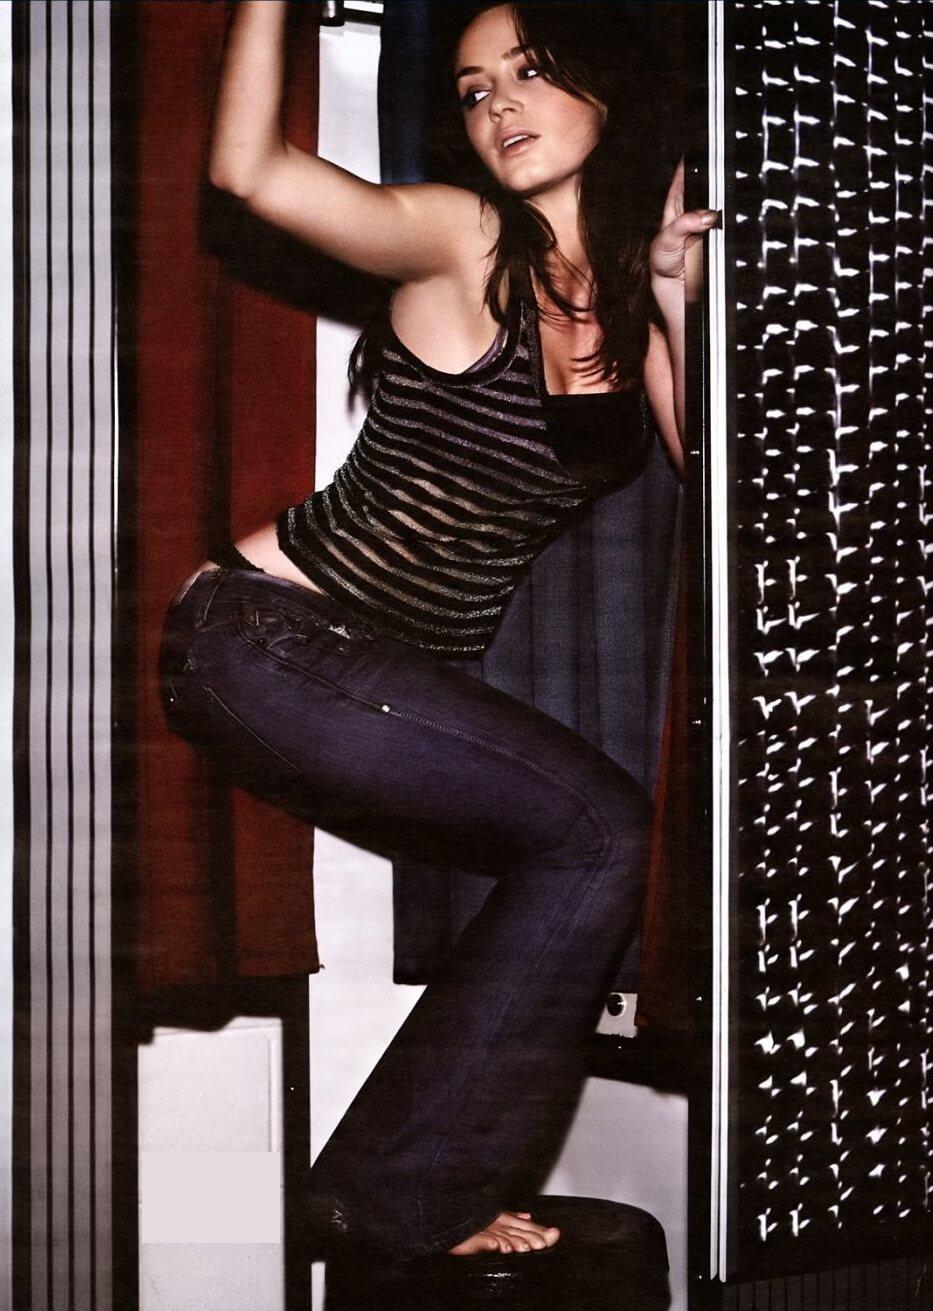 50 Hot And Sexz Photos Of Emily Blunt 12thblog